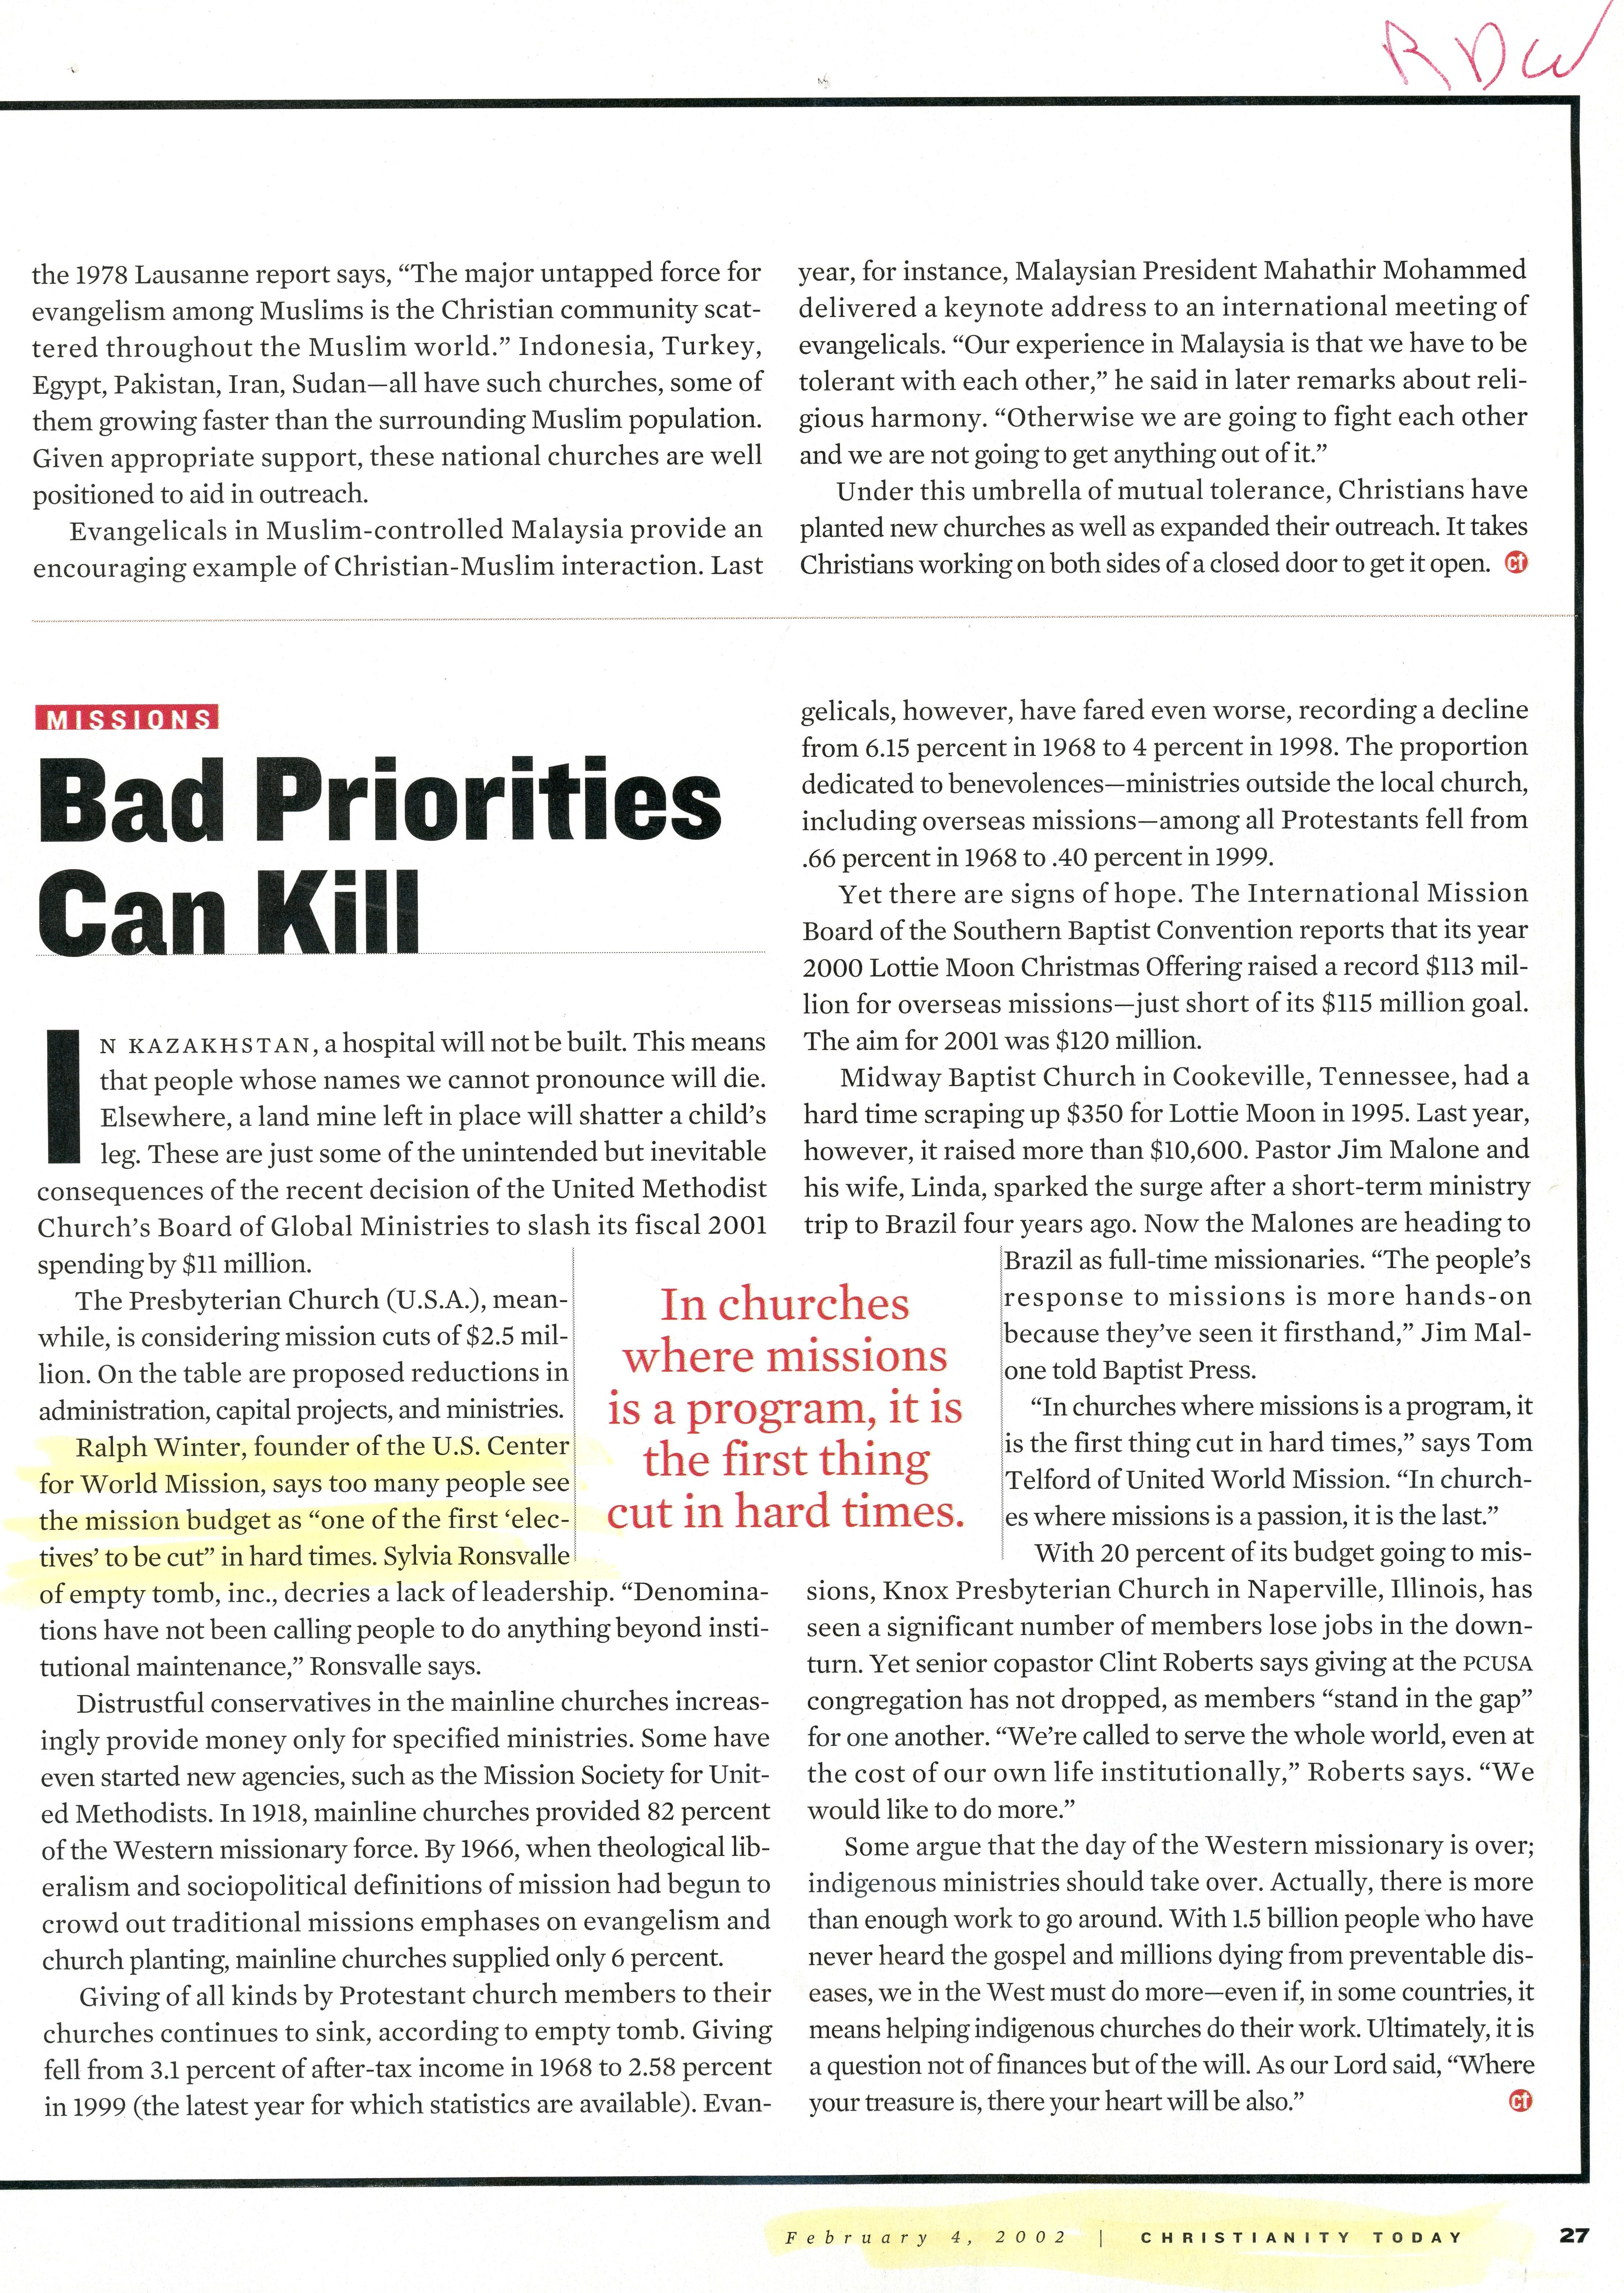 CT Article Feb 2002